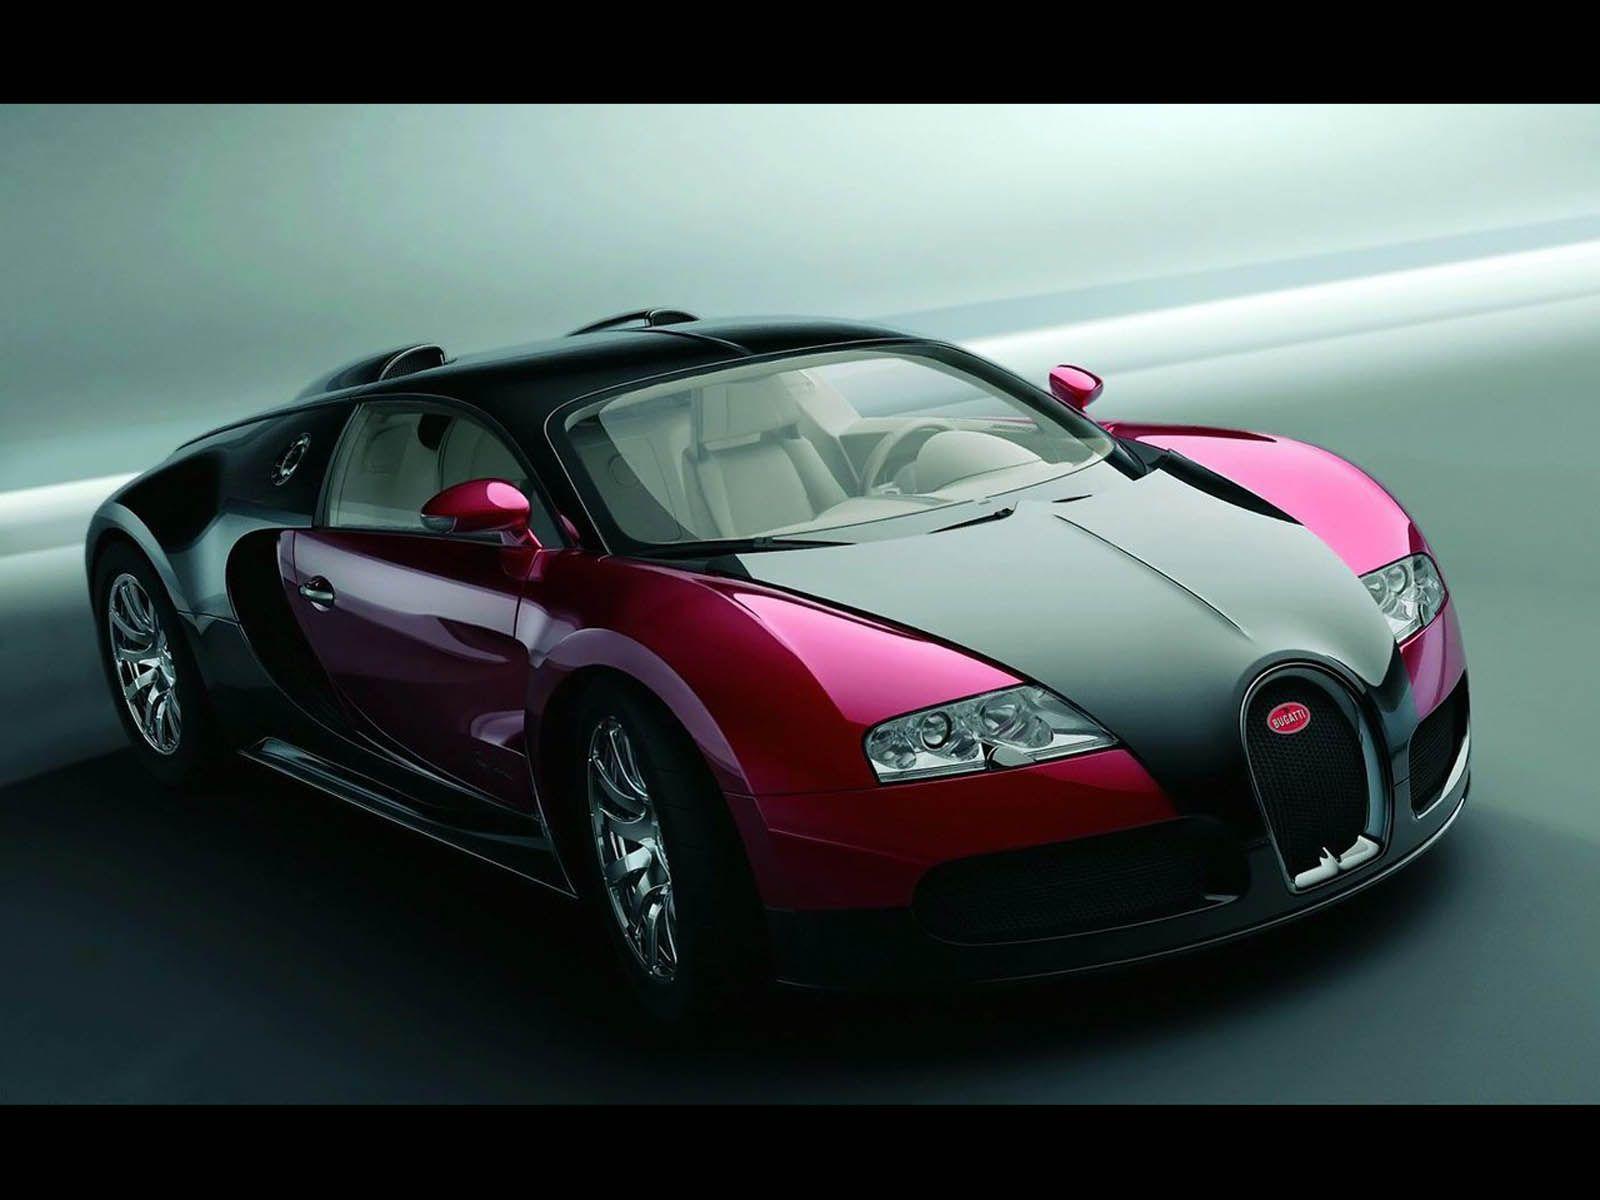 e1bdcb405e2faf6ba03d3e66d96eff42 Astounding Bugatti Veyron Need for Speed World Cars Trend